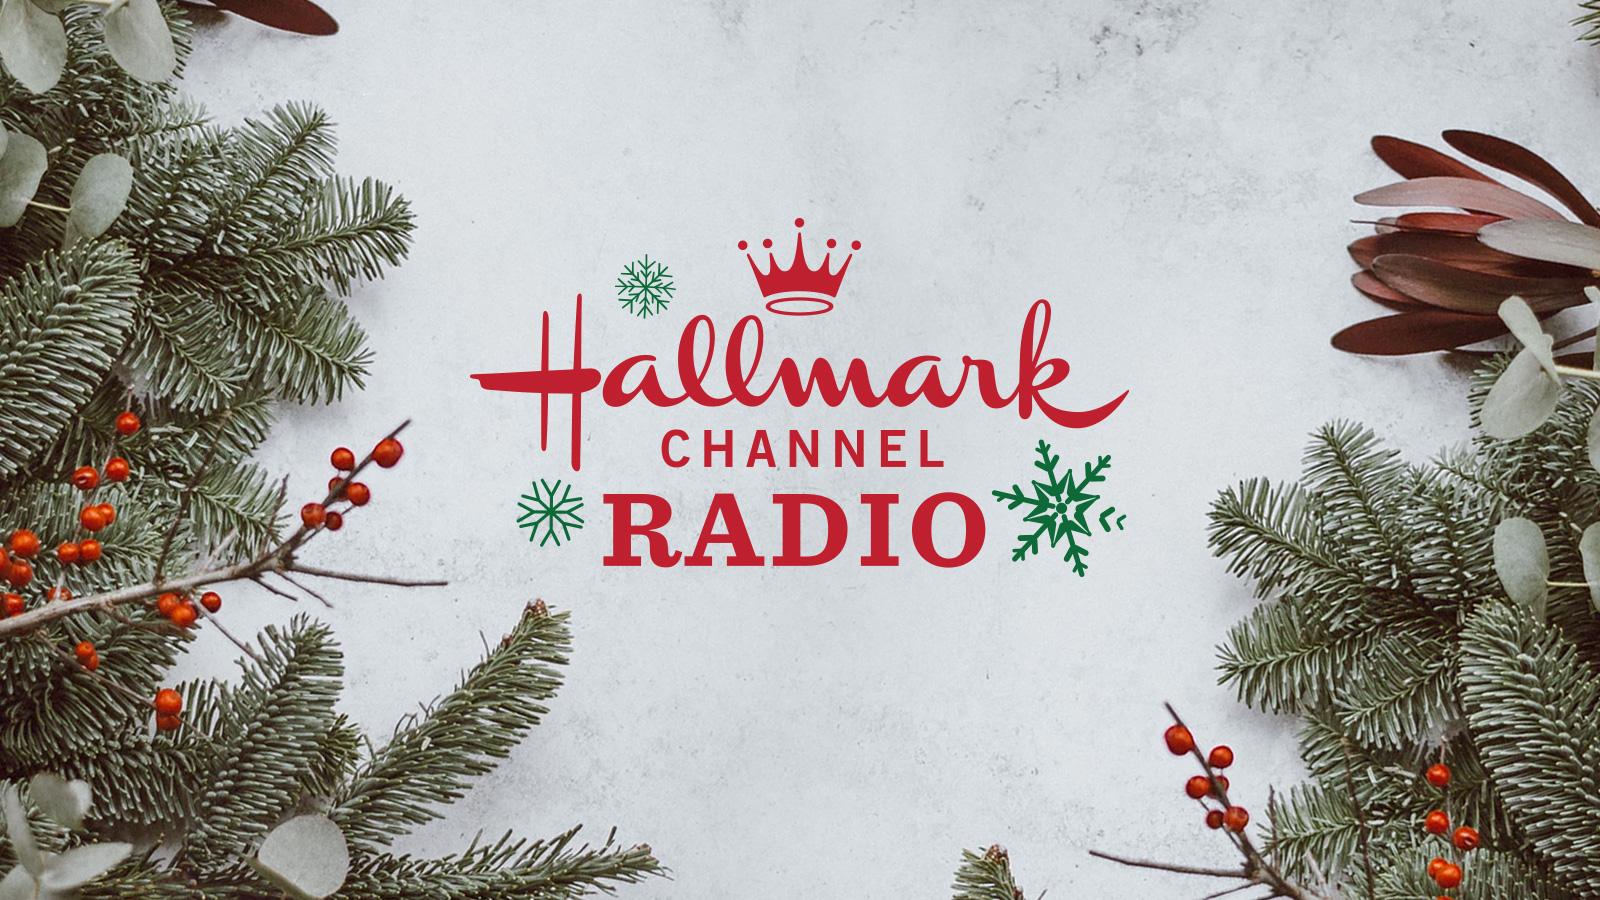 Christmas Radio Station.Hallmark Channel Siriusxm Present New Holiday Music Channel